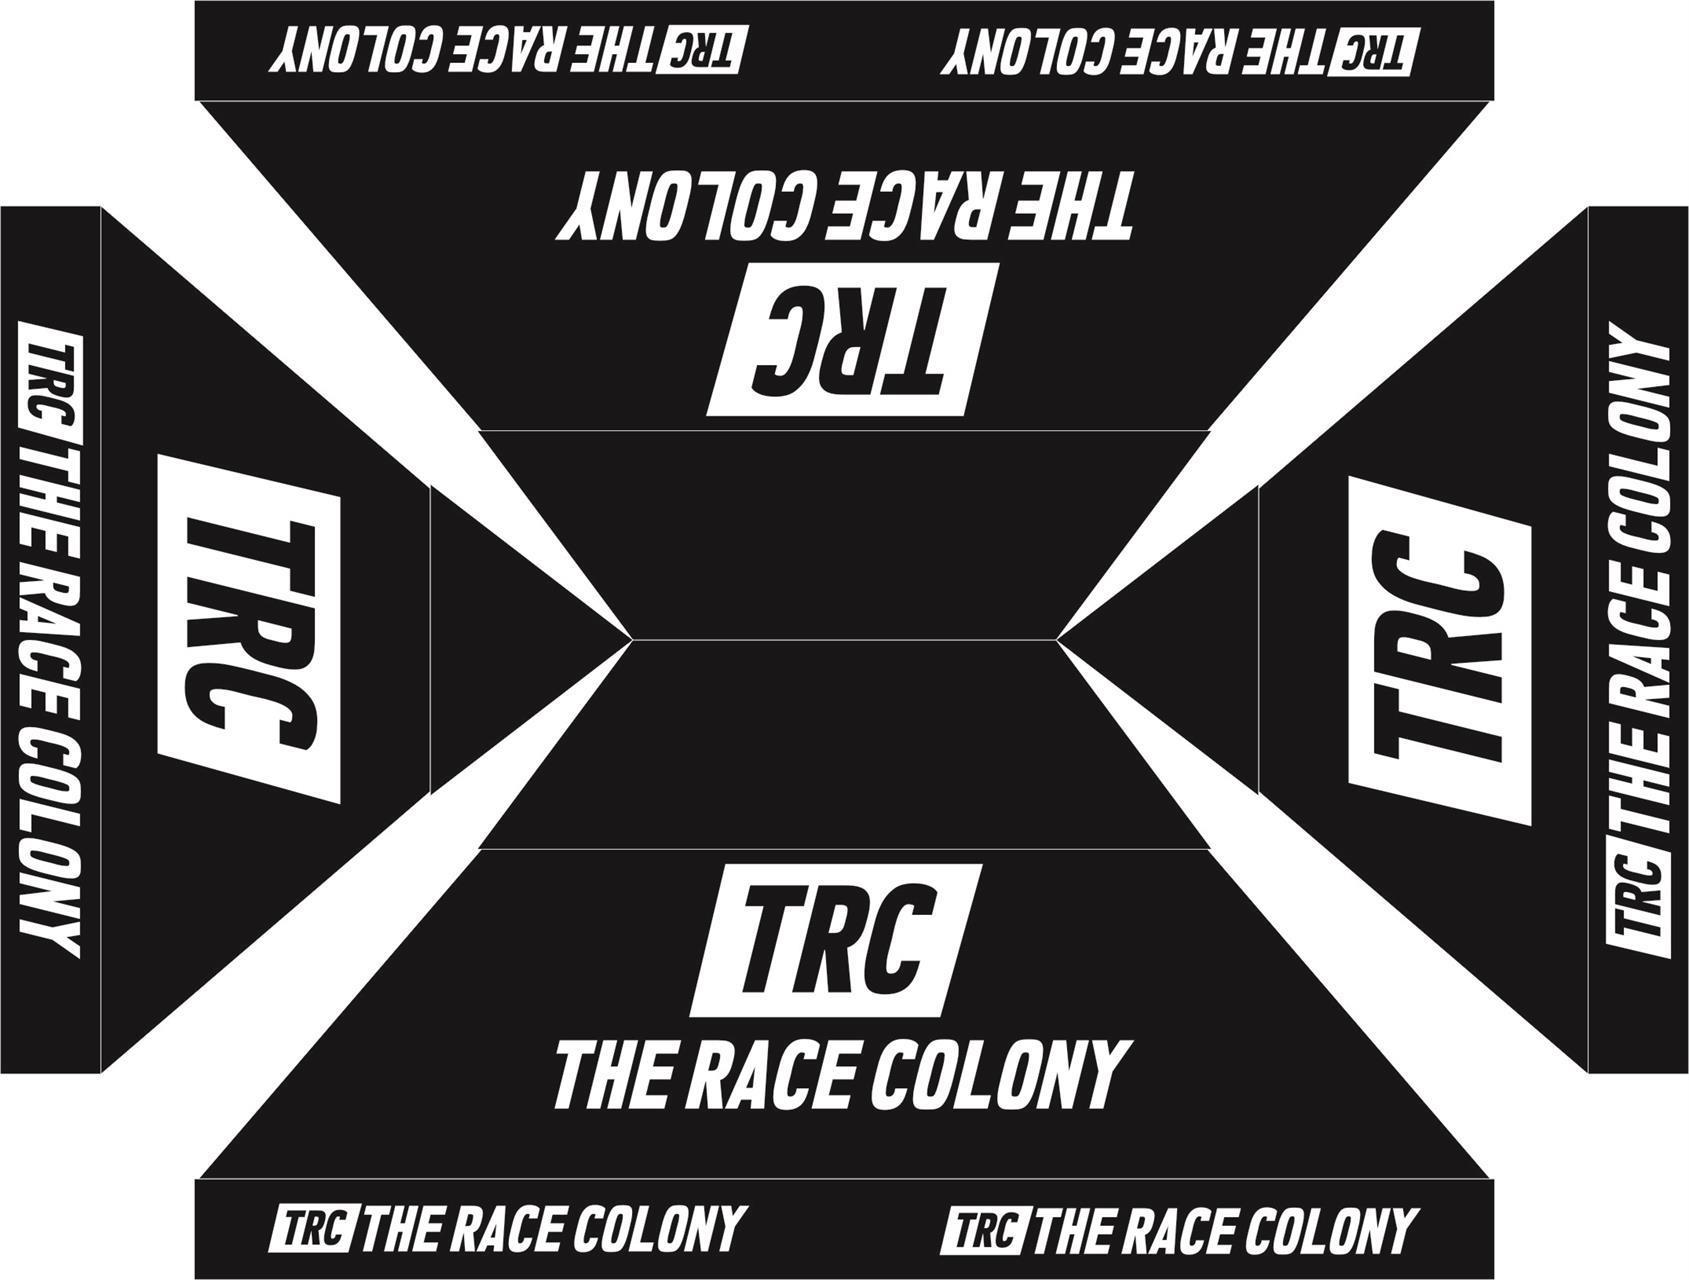 The Race Colony